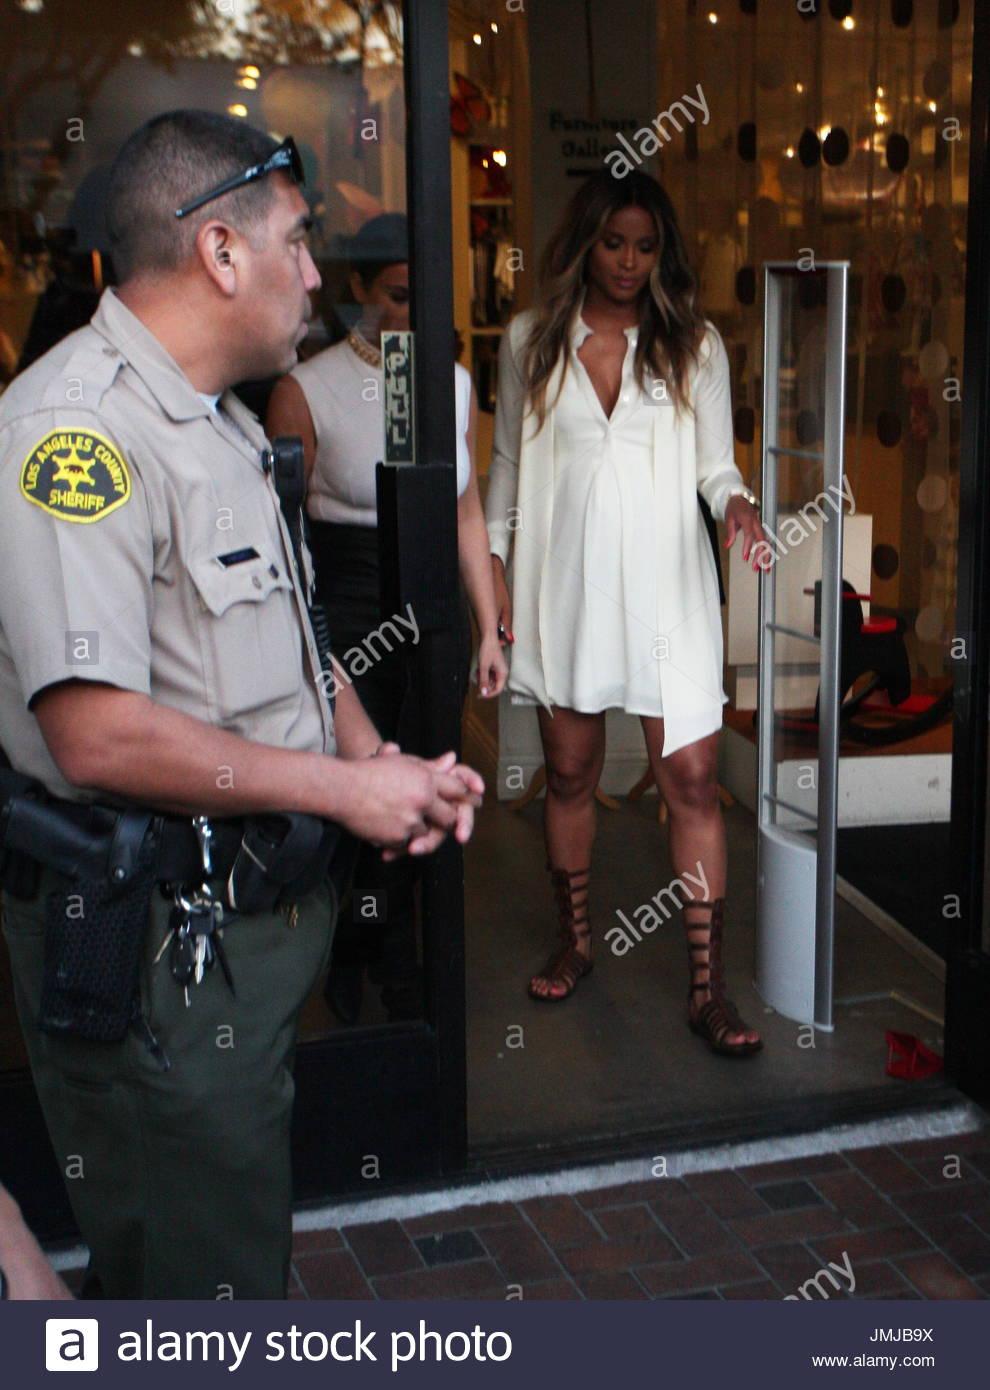 b34edda800 Kim Kardashian and Ciara shop together at Bel Bambini while filming a  segment of Keeping Up With the  Kardashians  in West Hollywood